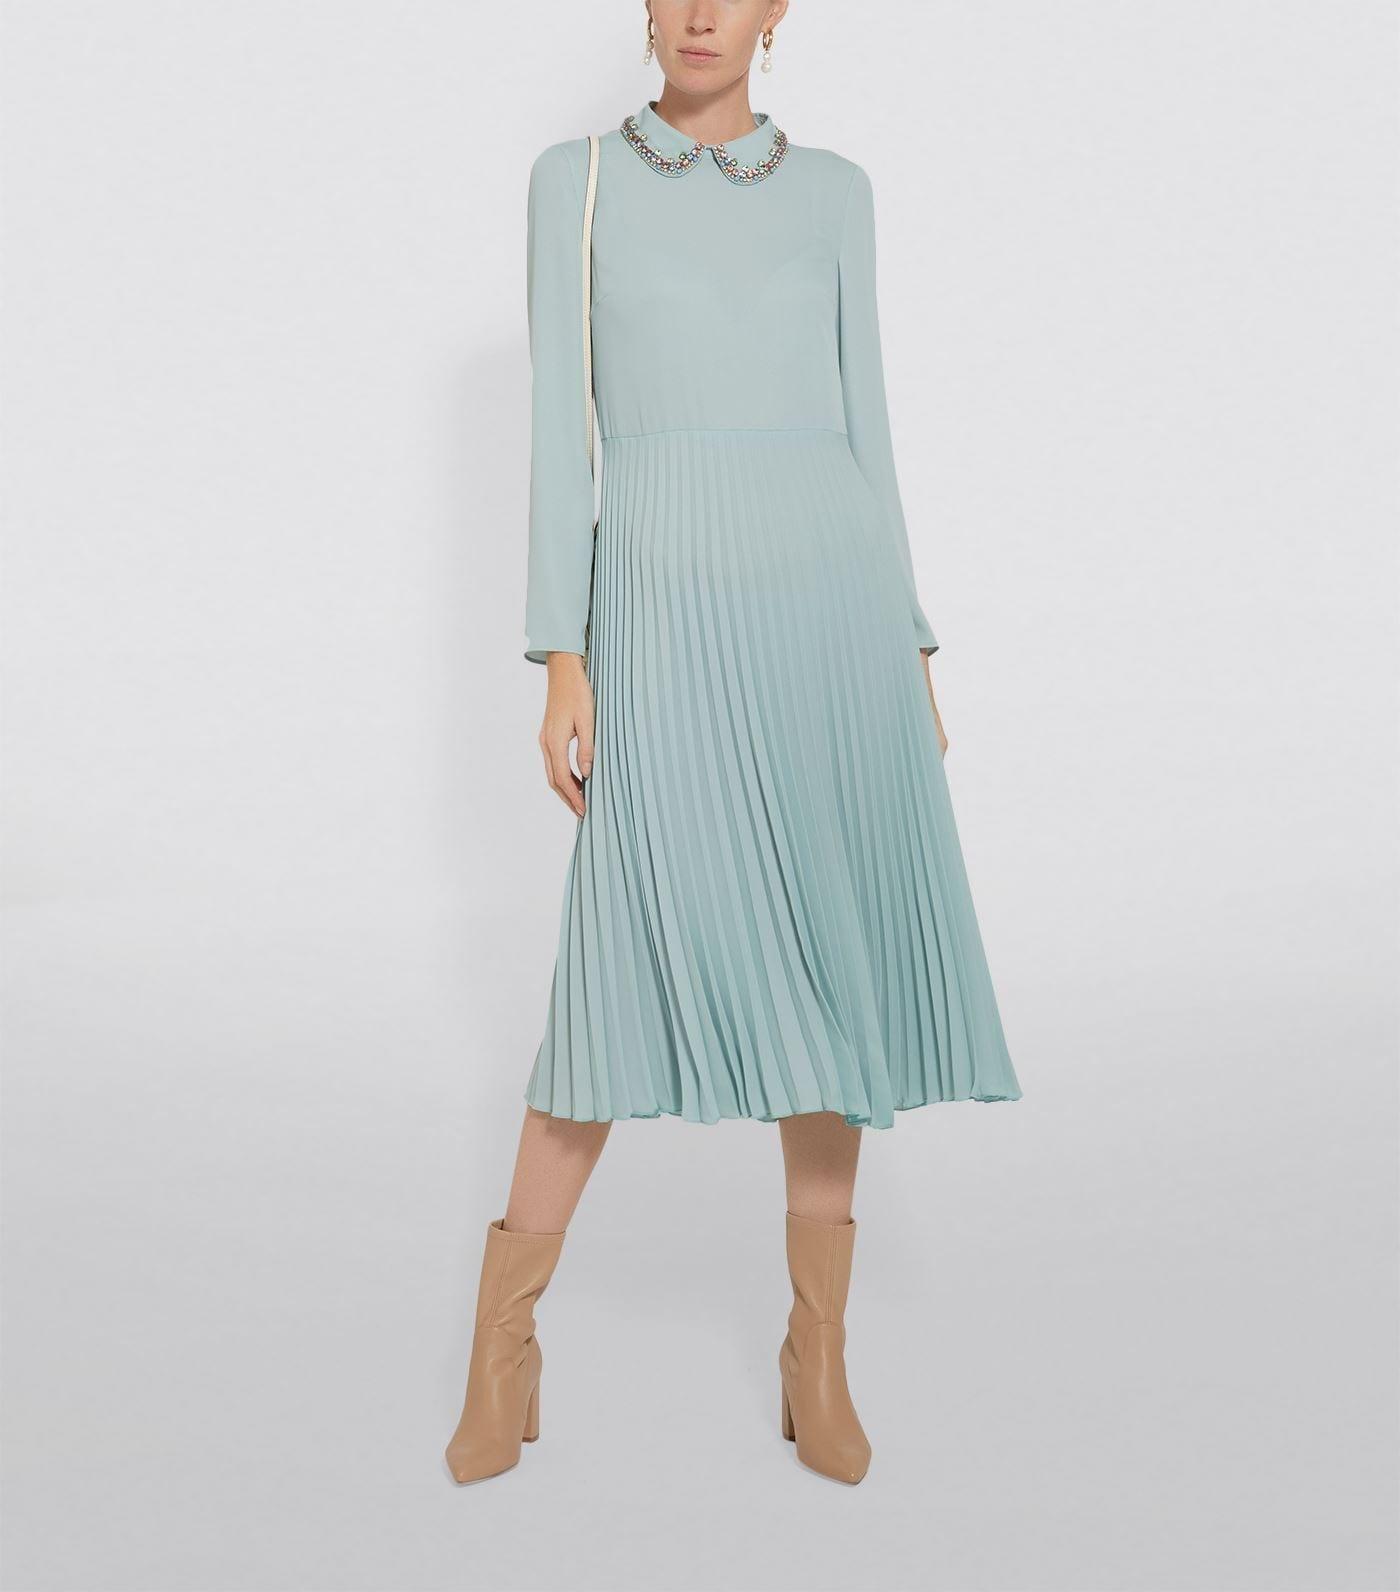 RED VALENTINO Crystal Collar Midi Dress